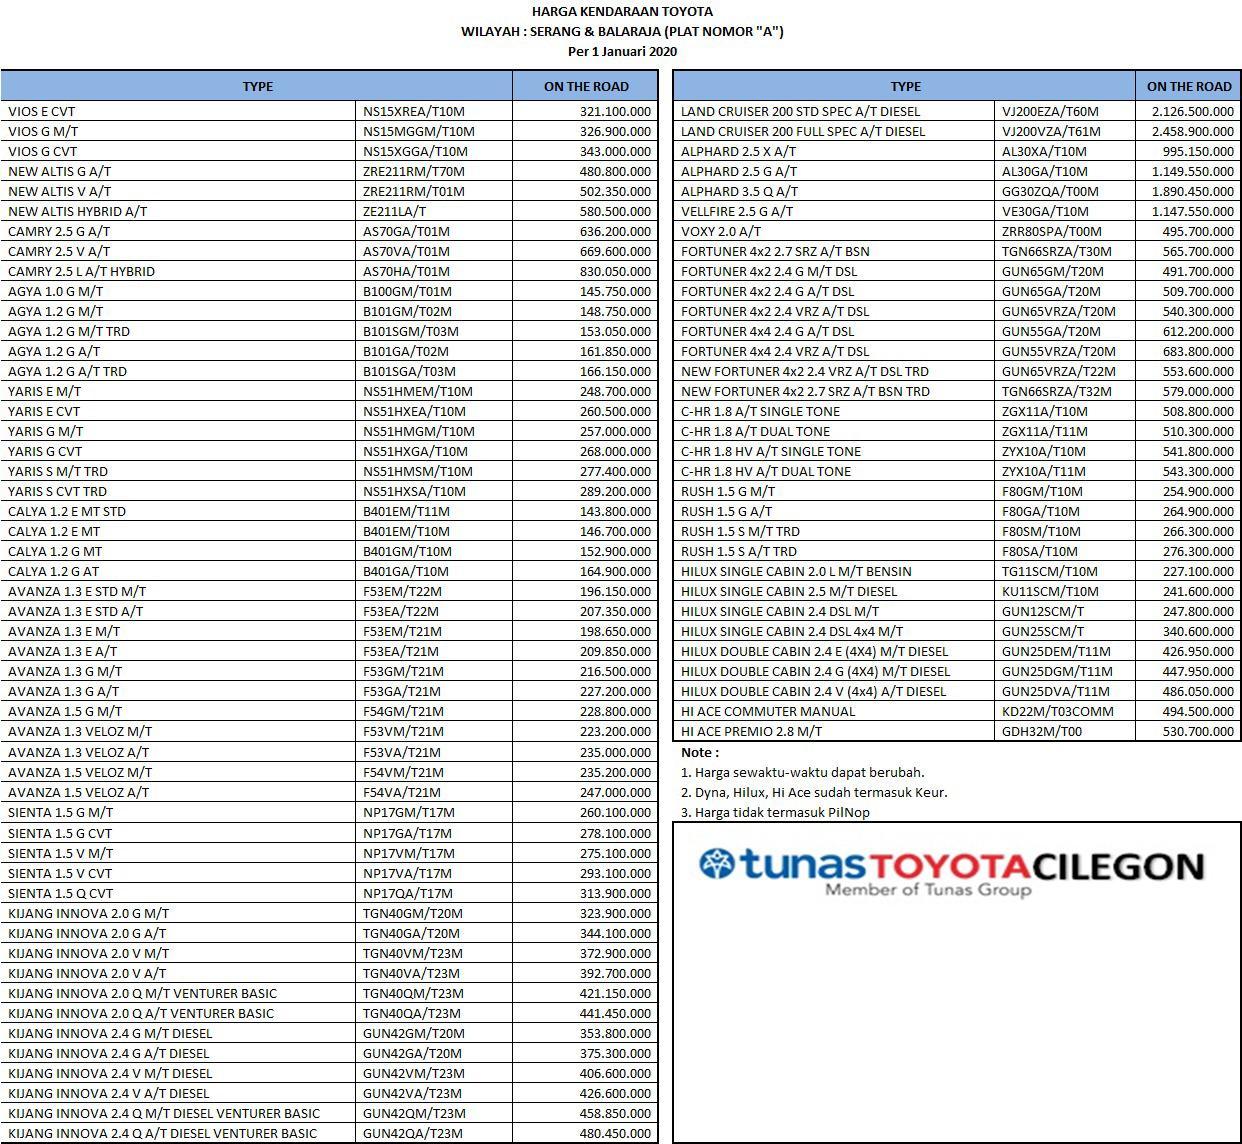 Price List OTR Toyota Cilegon Serang 2020